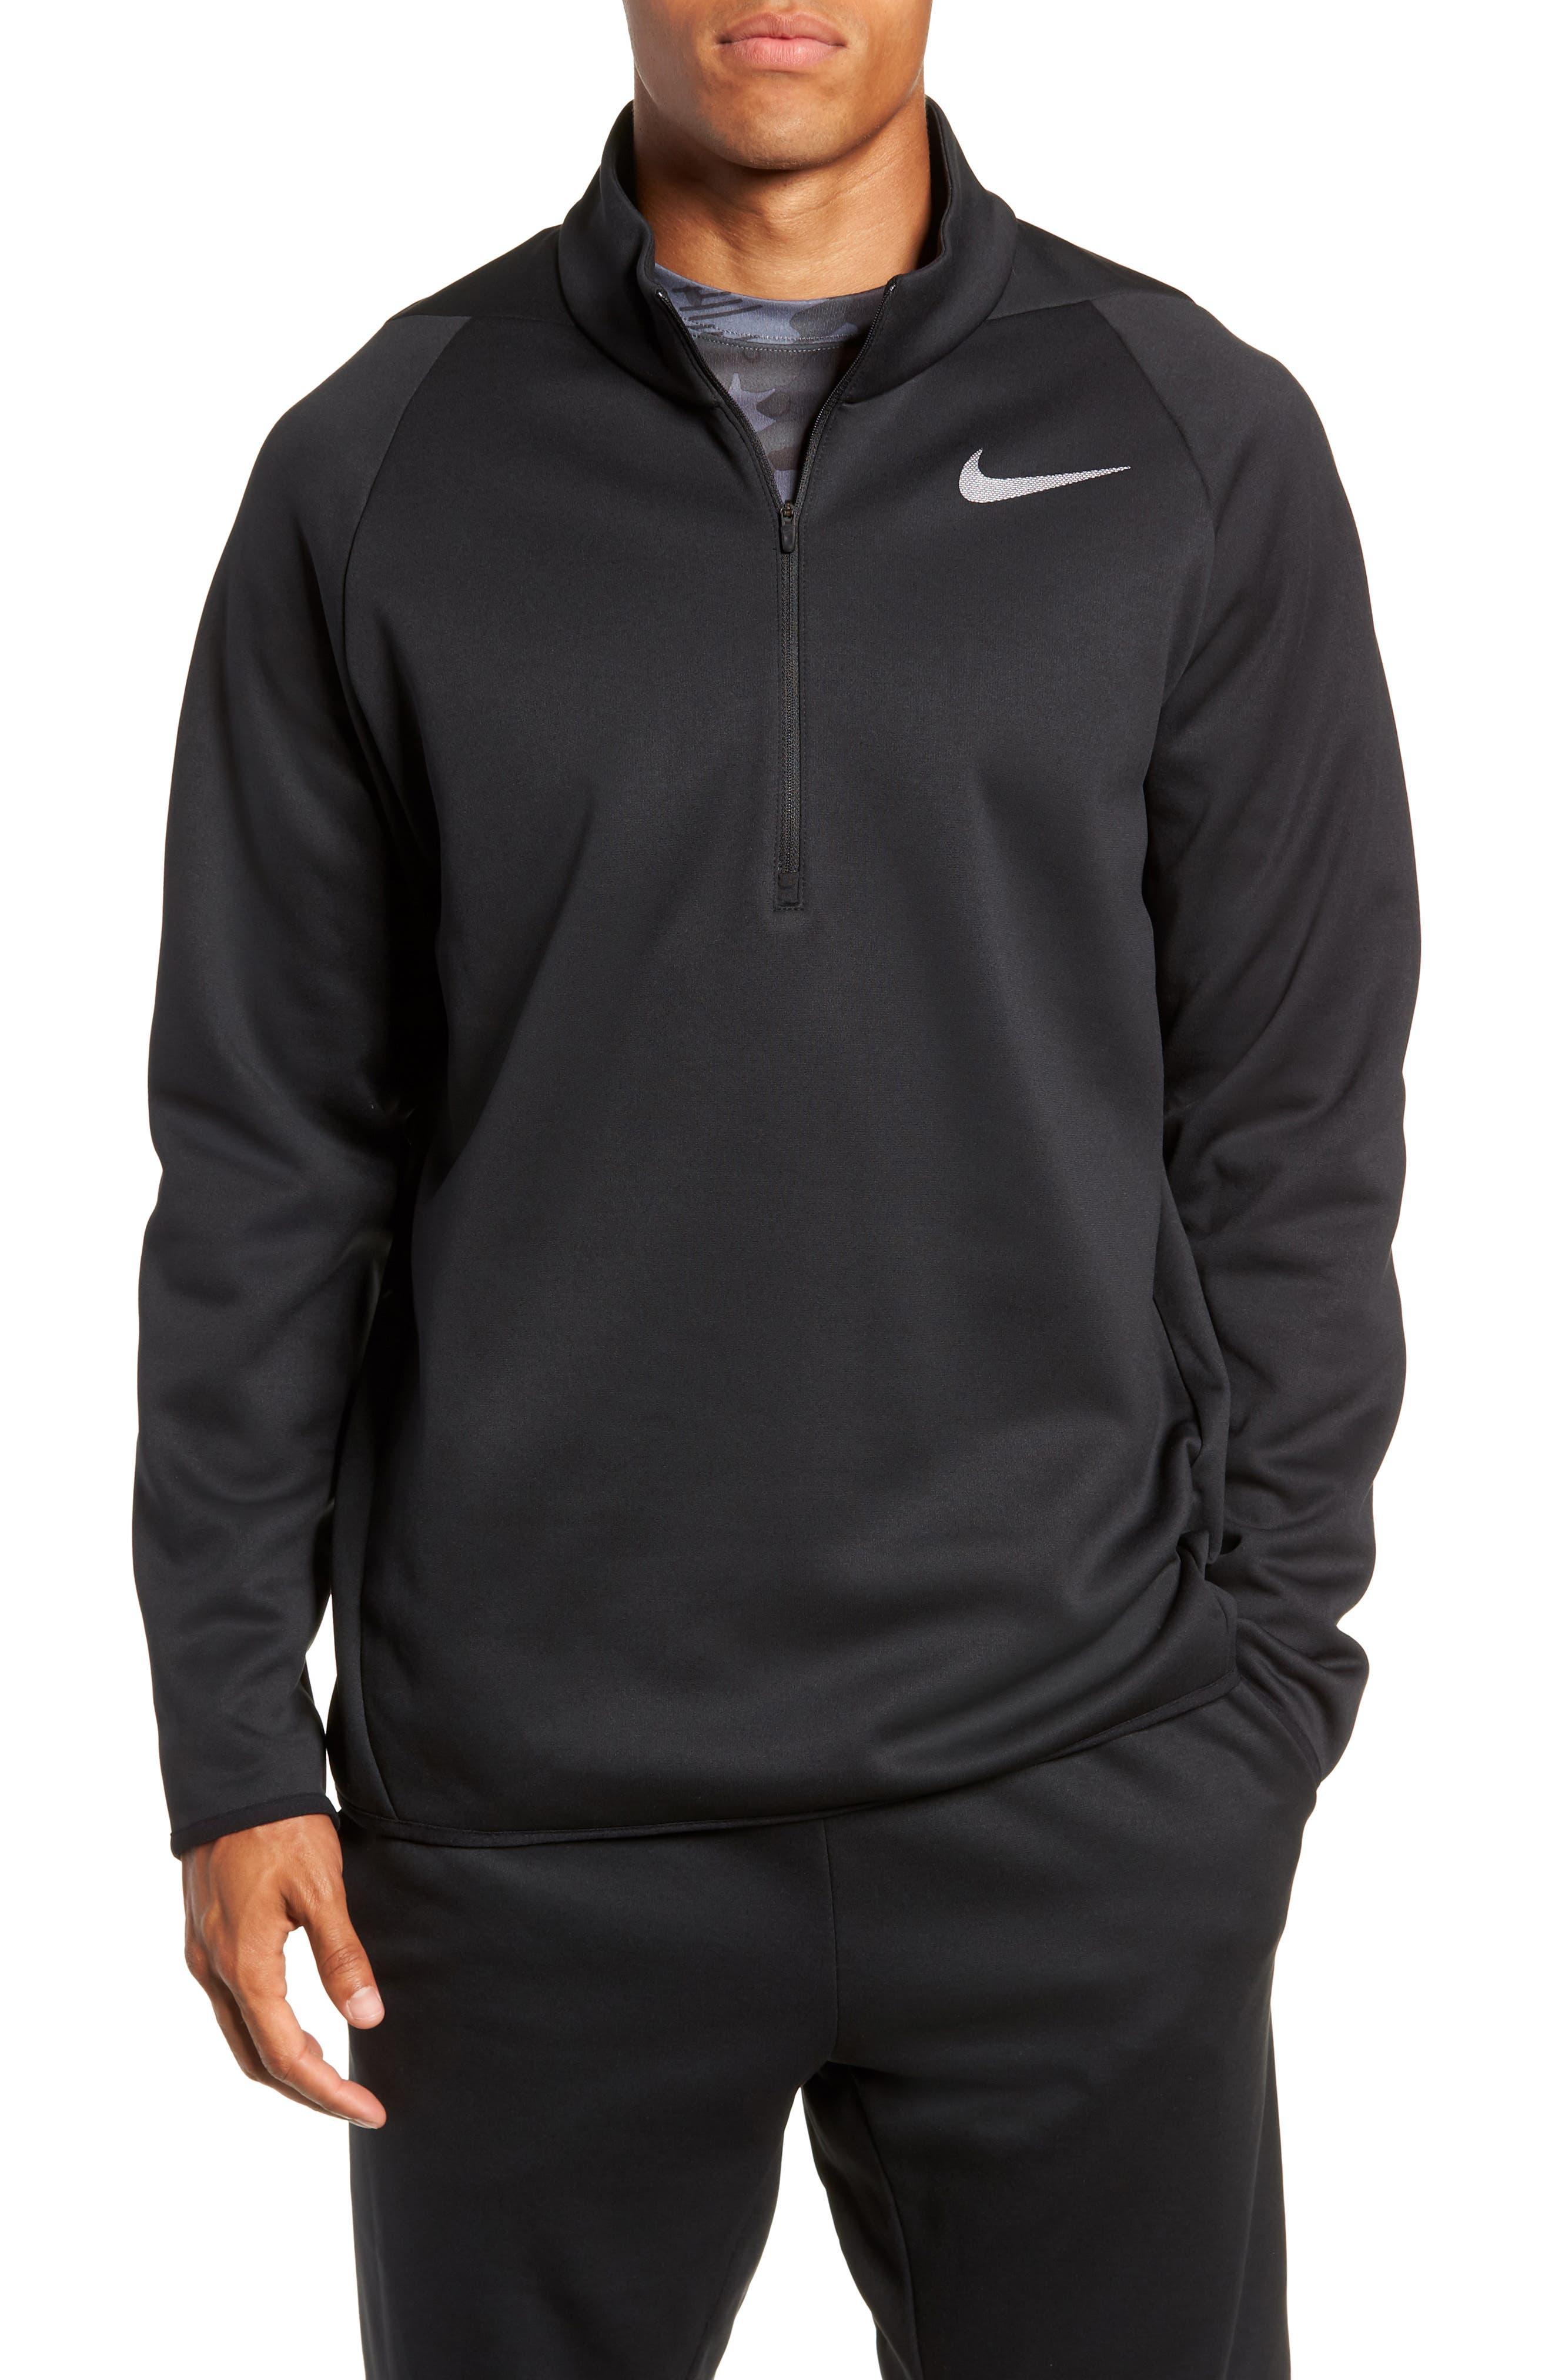 Quarter Zip Pullover,                         Main,                         color, BLACK/ DARK GREY